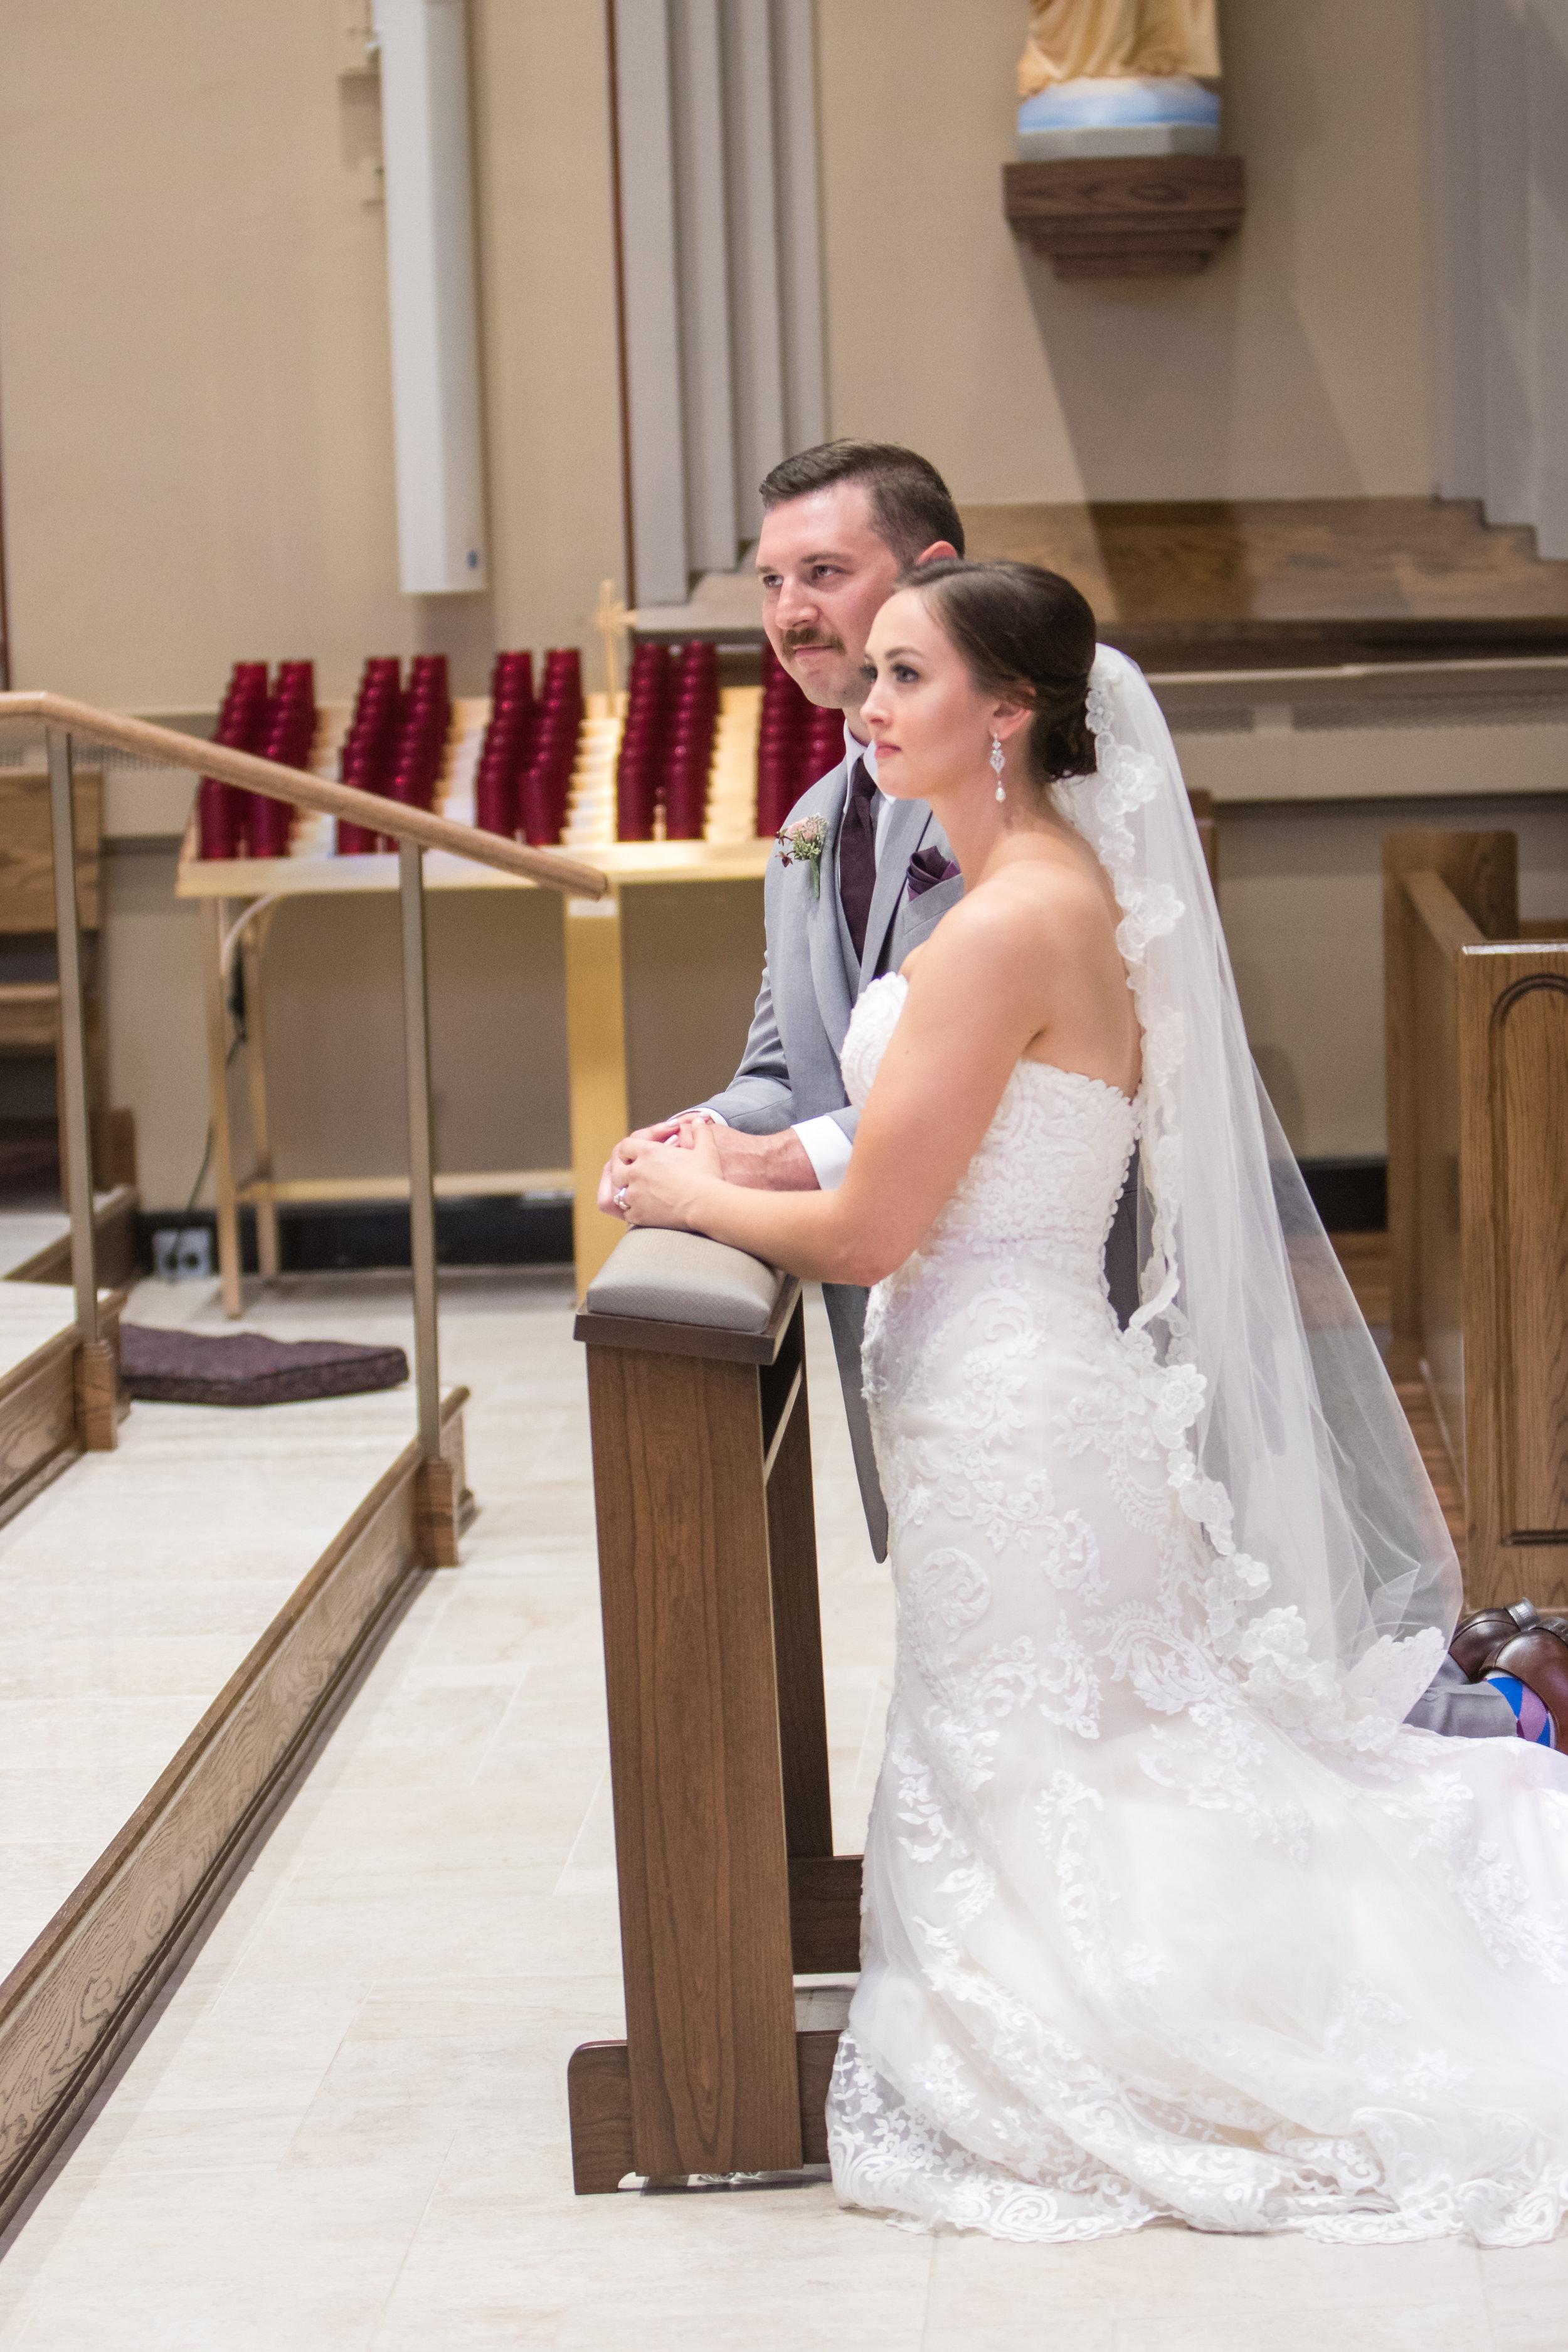 Courtney-Andy-Wedding-Blog-86.jpg